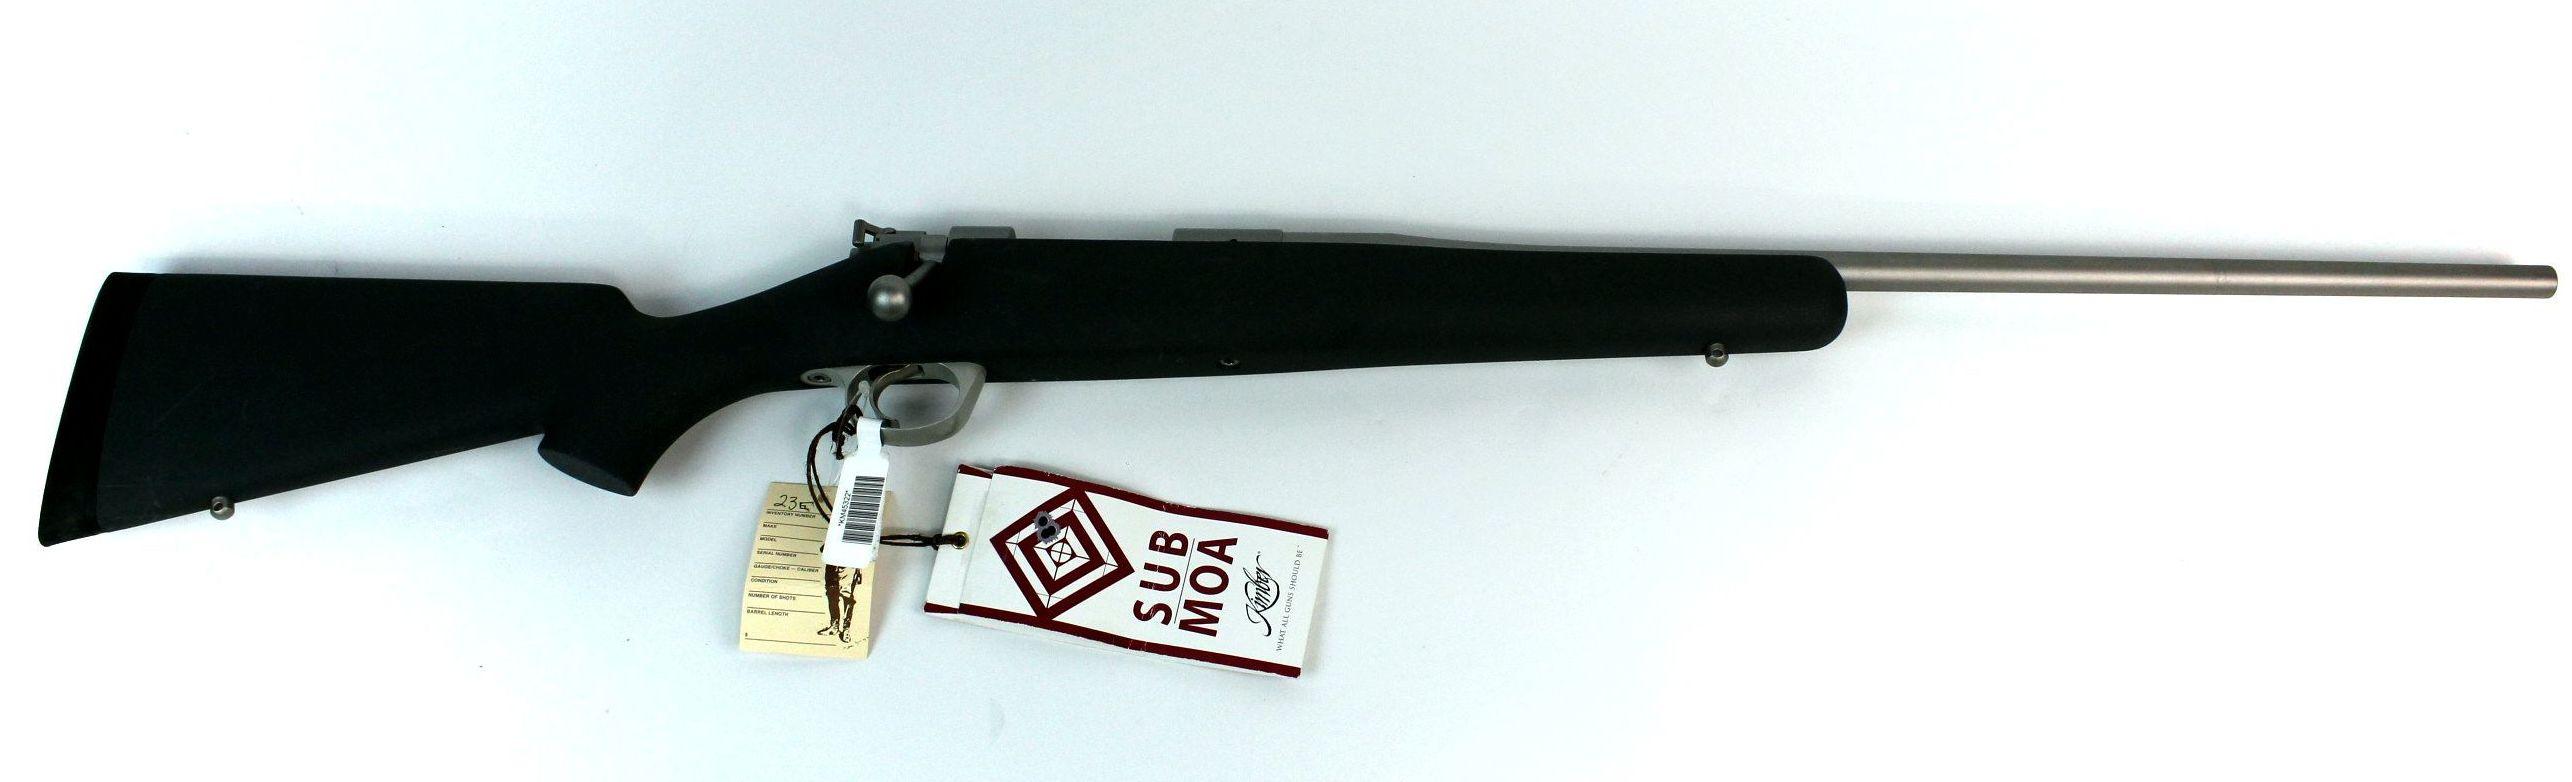 Kimber 84M Montana .308 WIN Bolt-Action Rifle-img-3